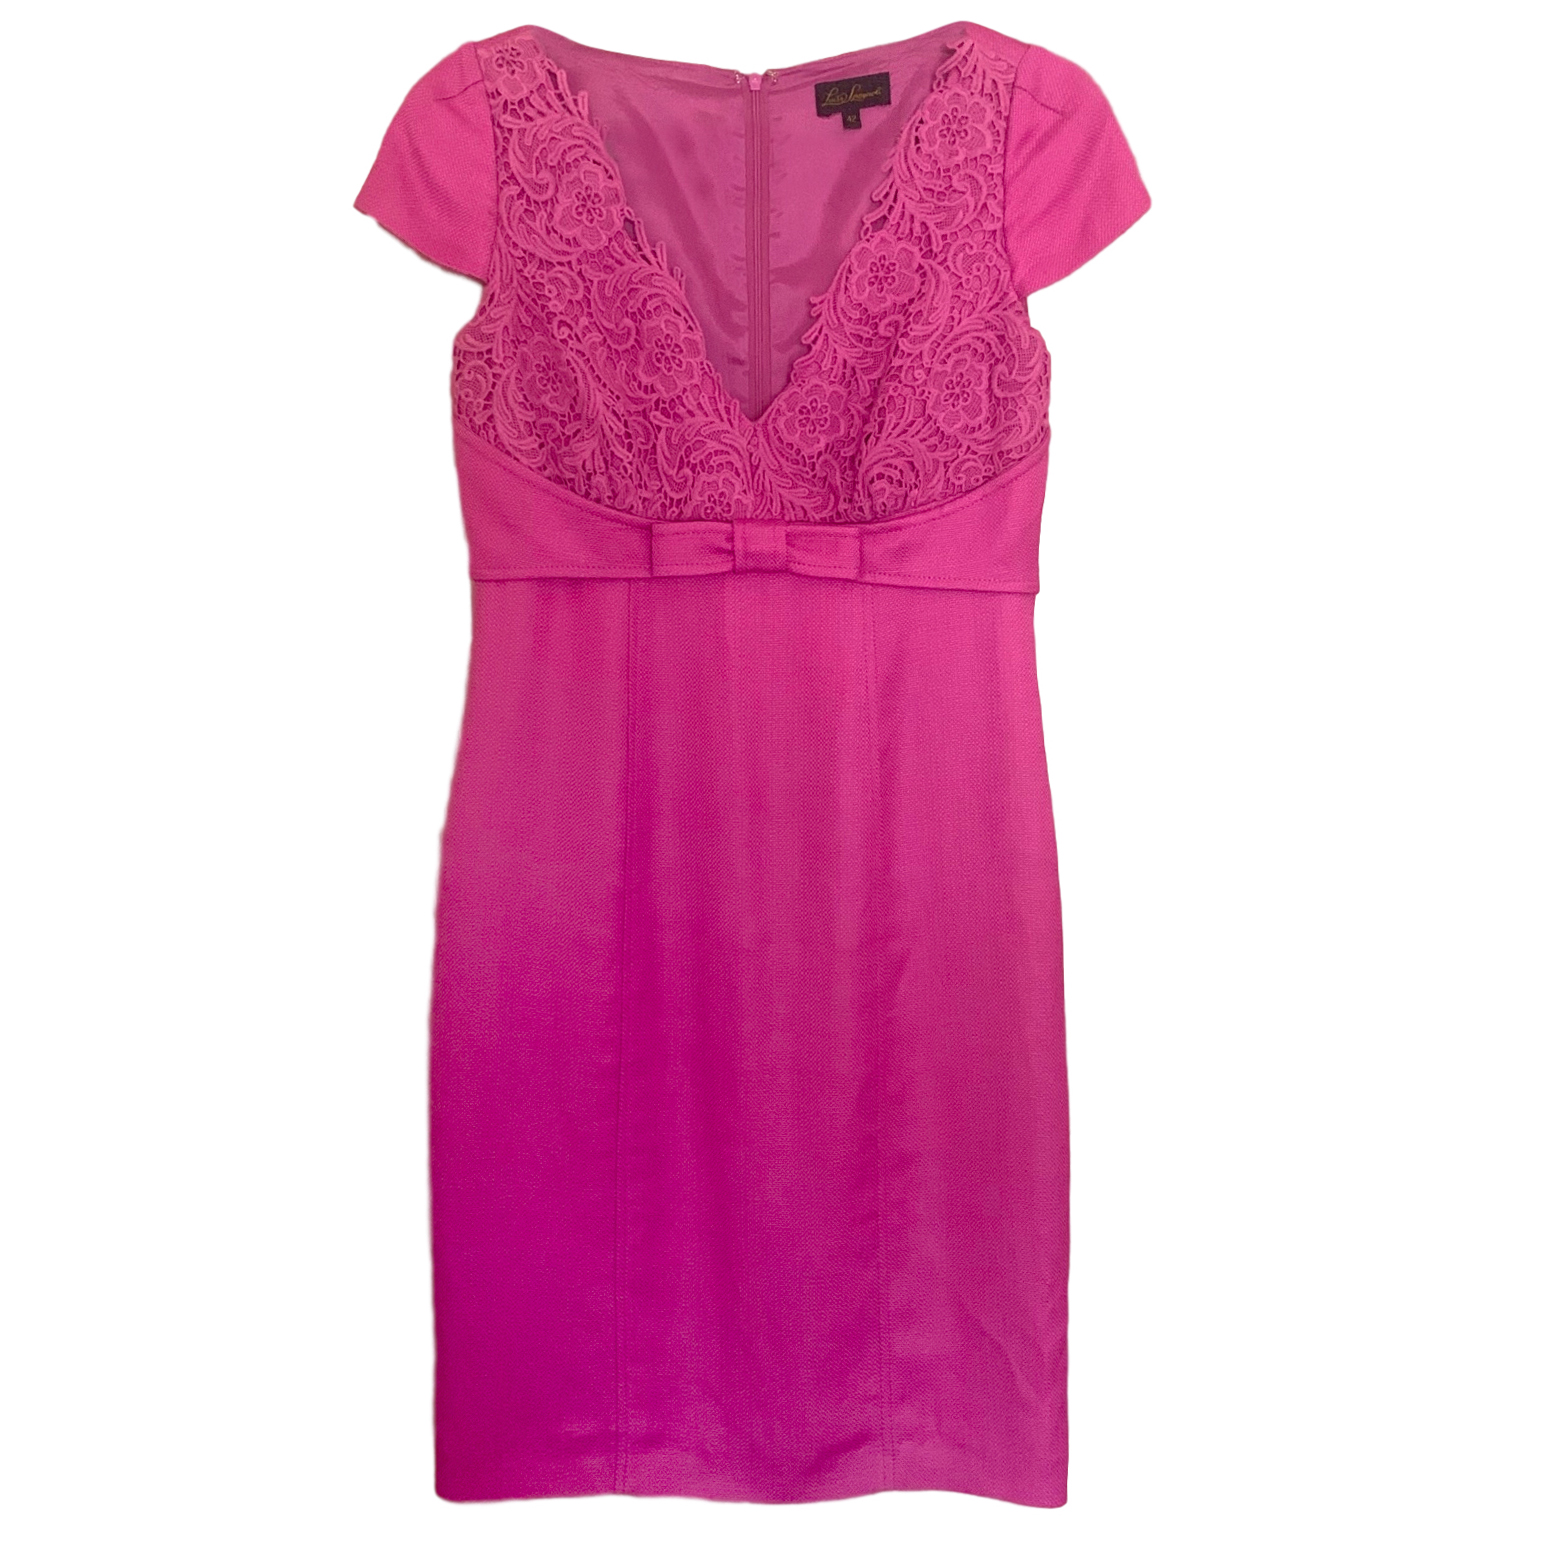 Luisa Spagnoli Pink Lace Trim Dress